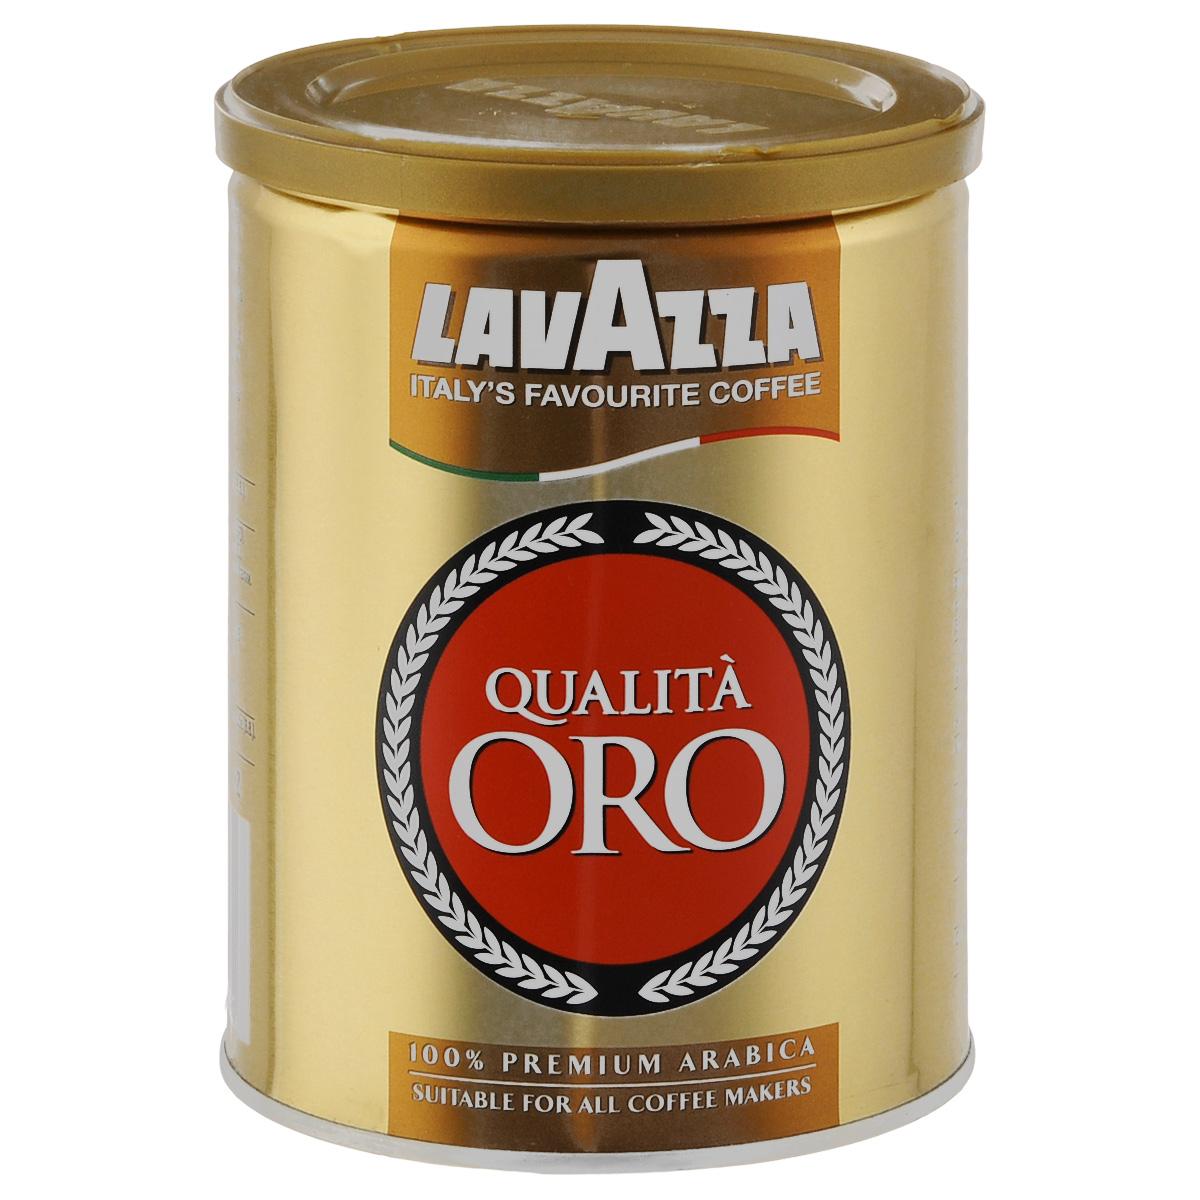 Lavazza Qualita Oro кофе молотый, 250 г брюки adidas брюки тренировочные adidas tiro17 swt pnt ay2960